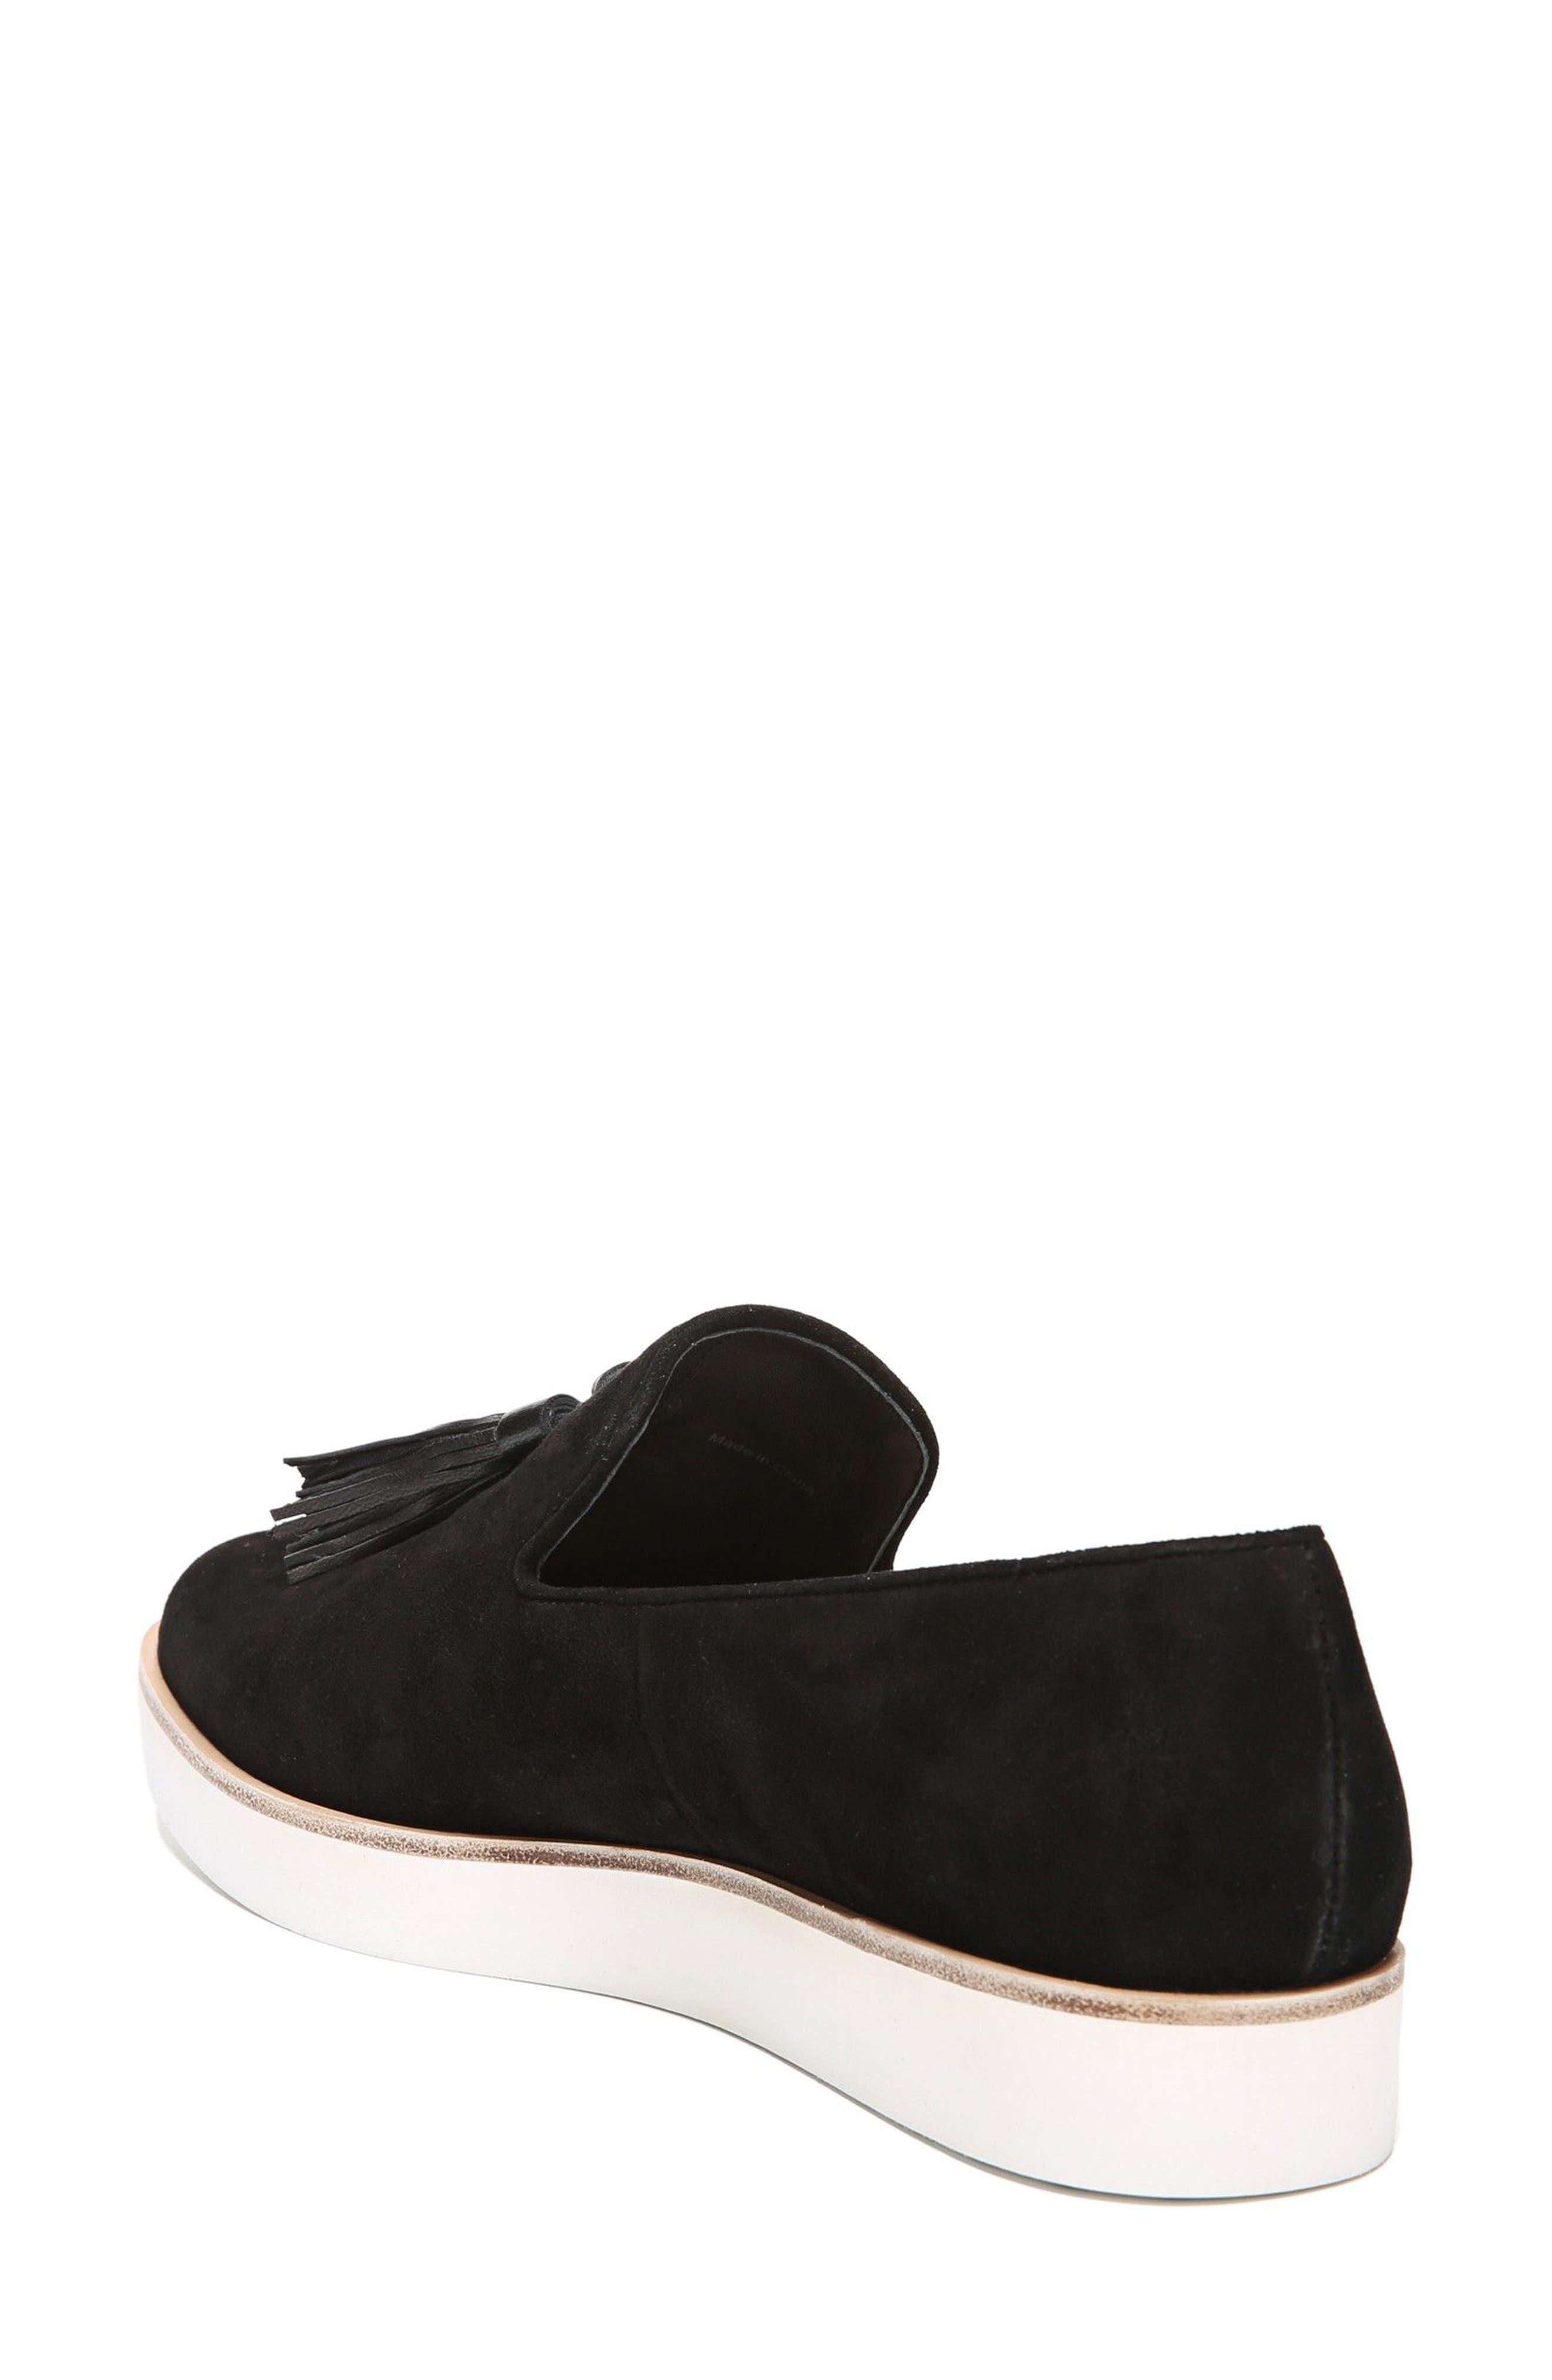 Toni Slip-On Sneaker,                             Alternate thumbnail 2, color,                             Black Suede